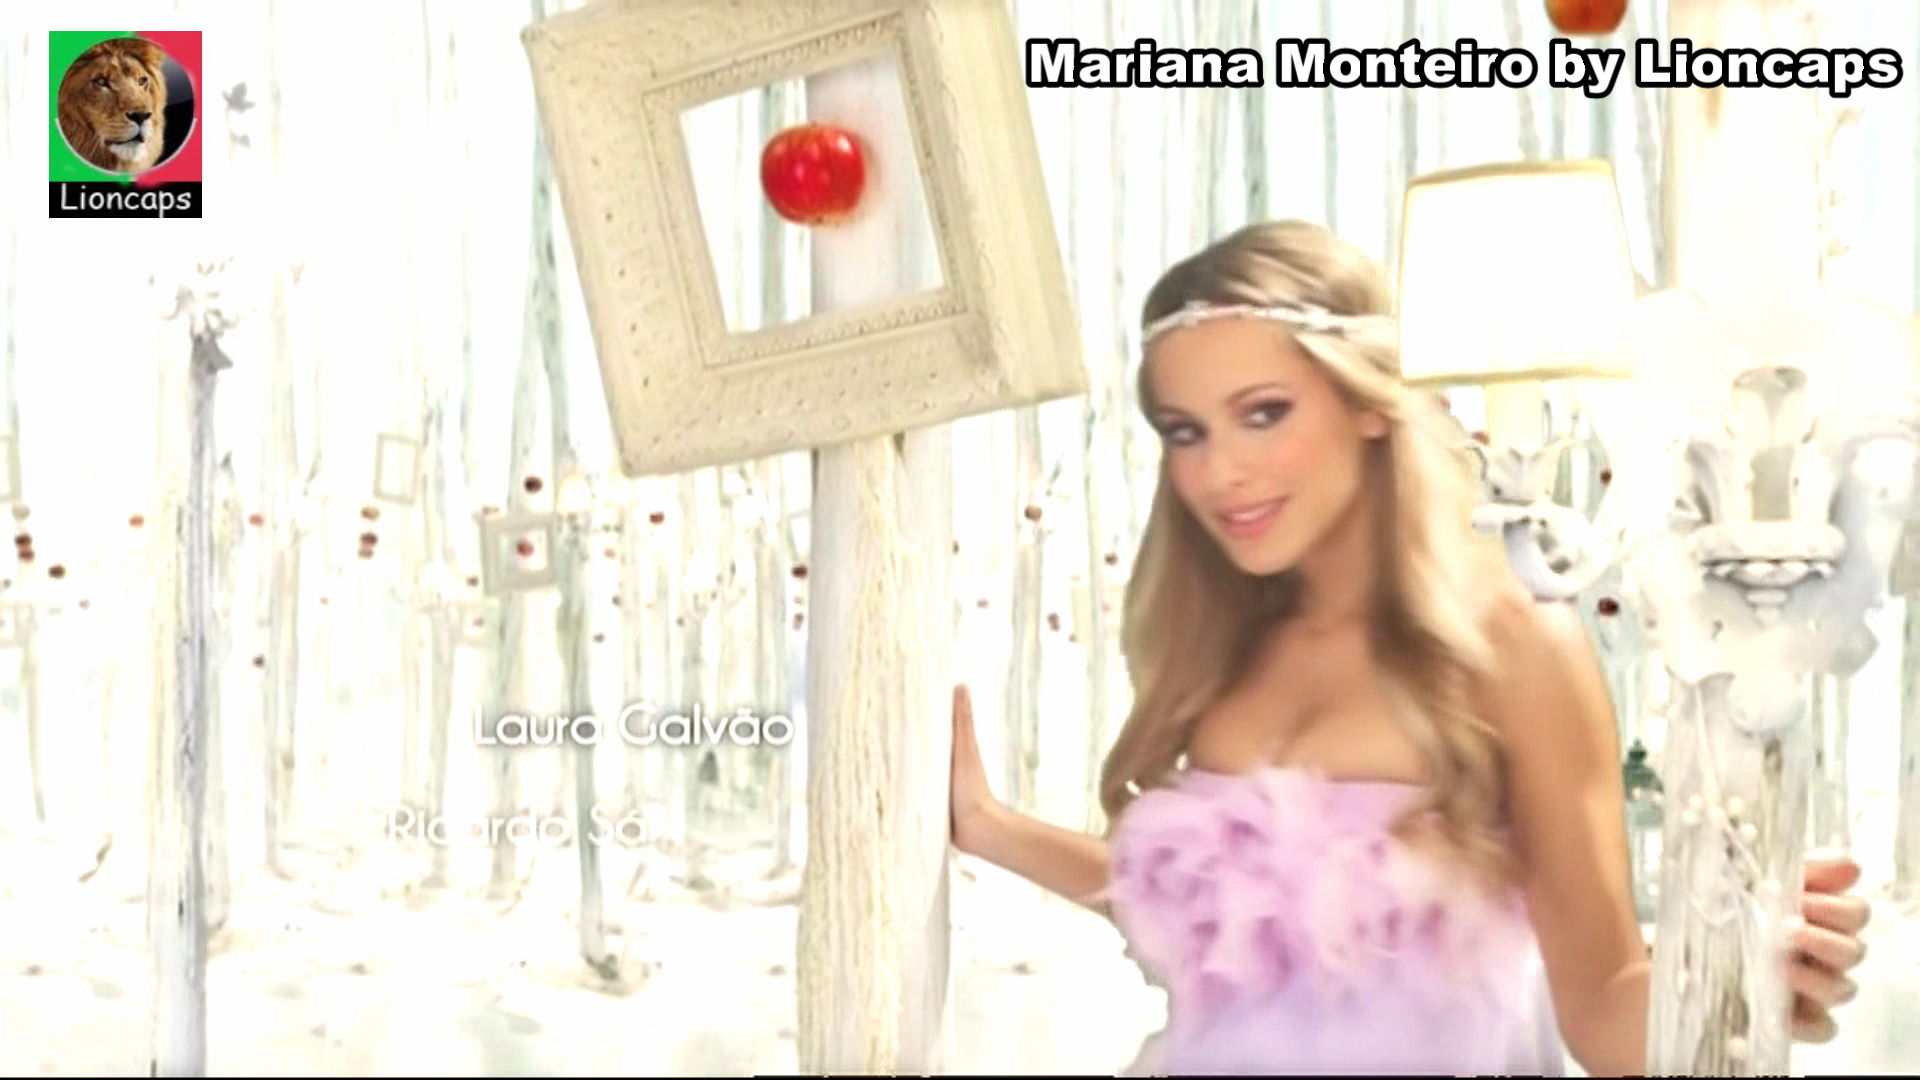 973837548_mariana_monteiro_vs190209_1927_122_40lo.JPG